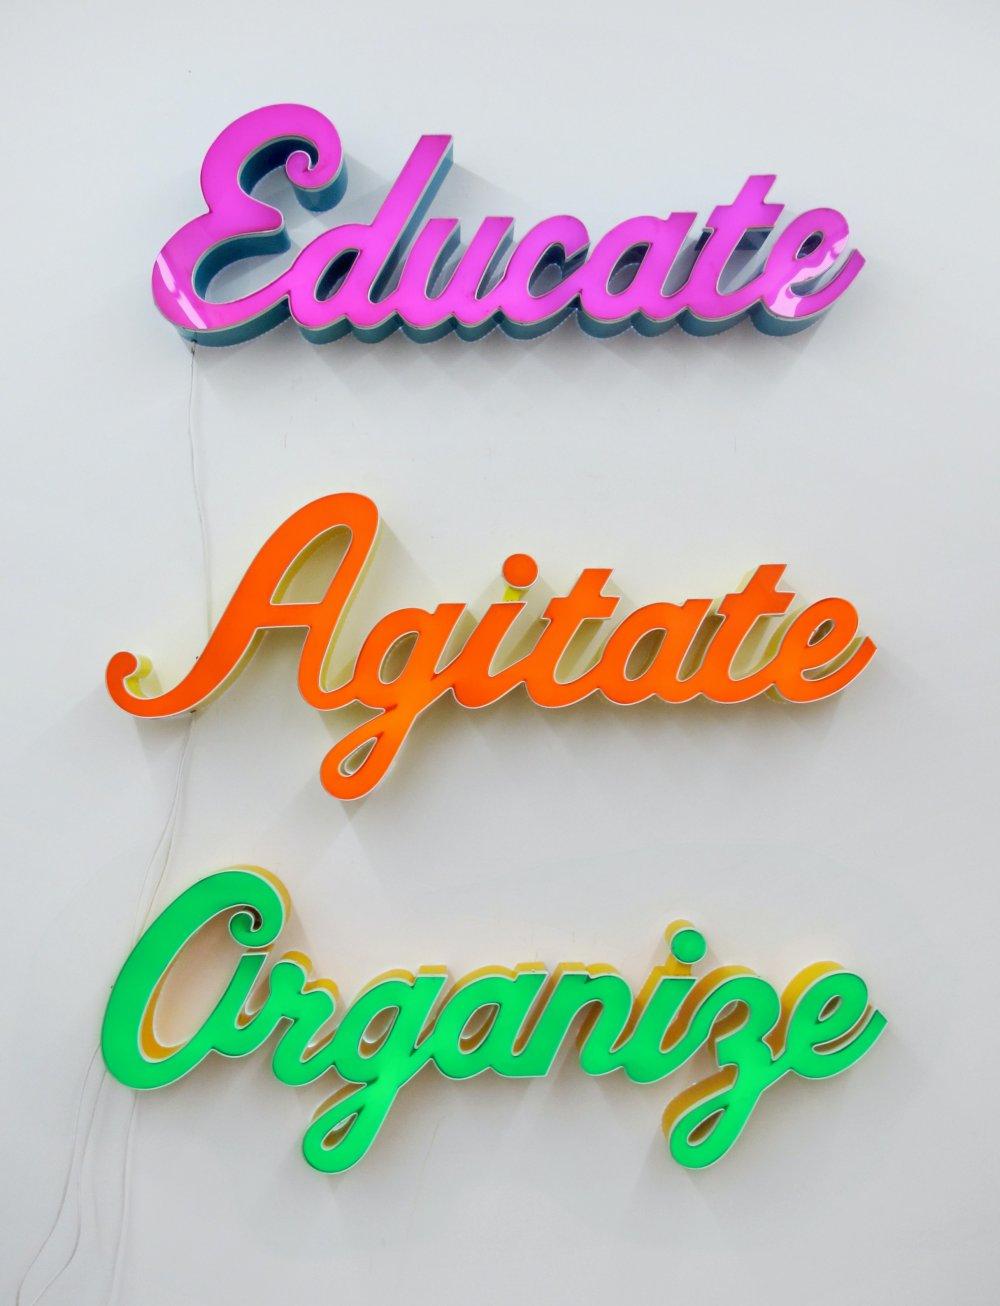 Educate, Agitate, Organize